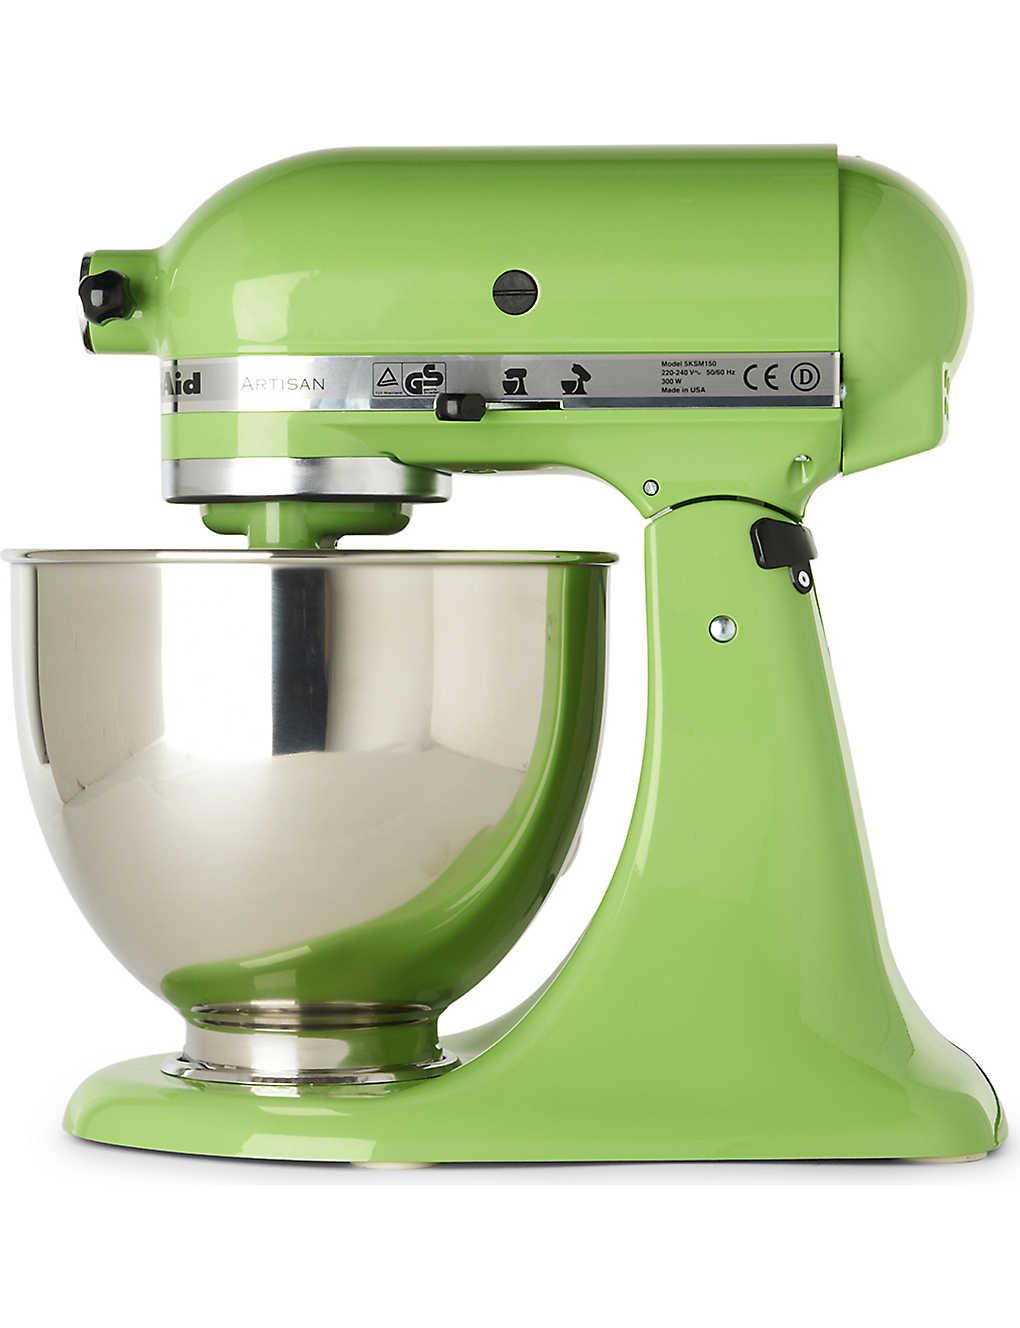 KITCHENAID - Artisan mixer green apple | Selfridges.com